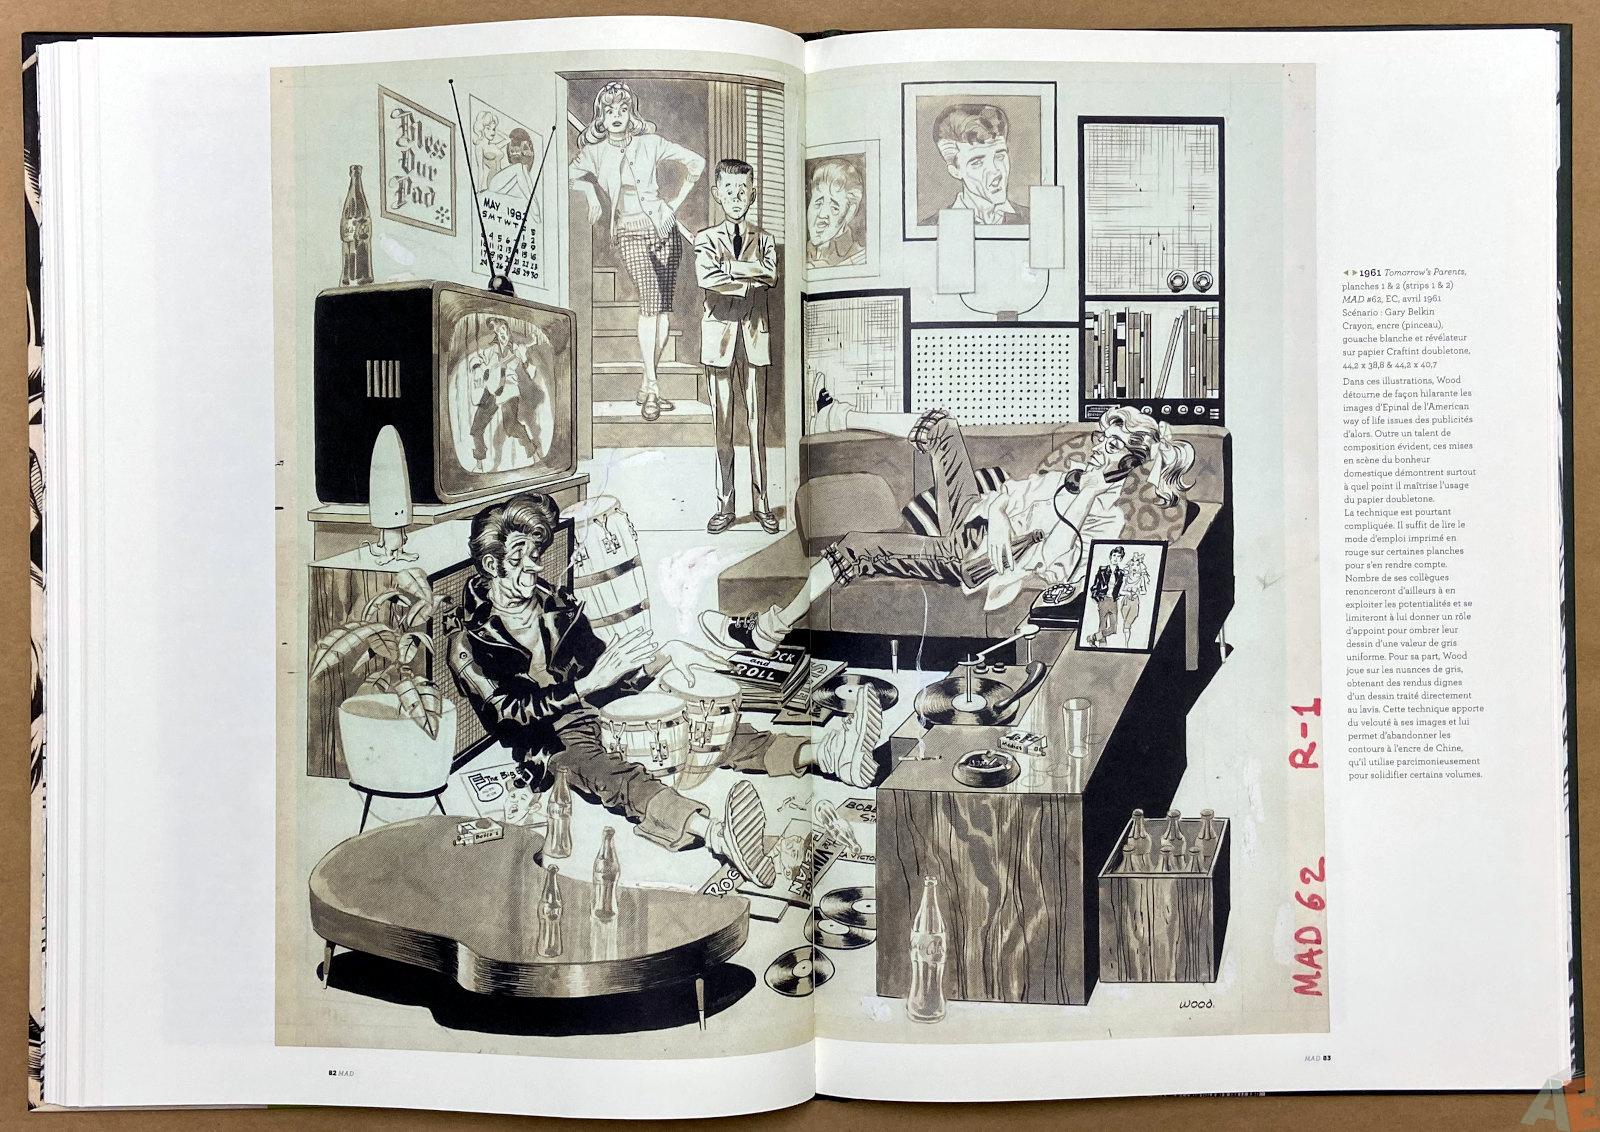 Les Mondes De Wallace Wood catalogue interior 9